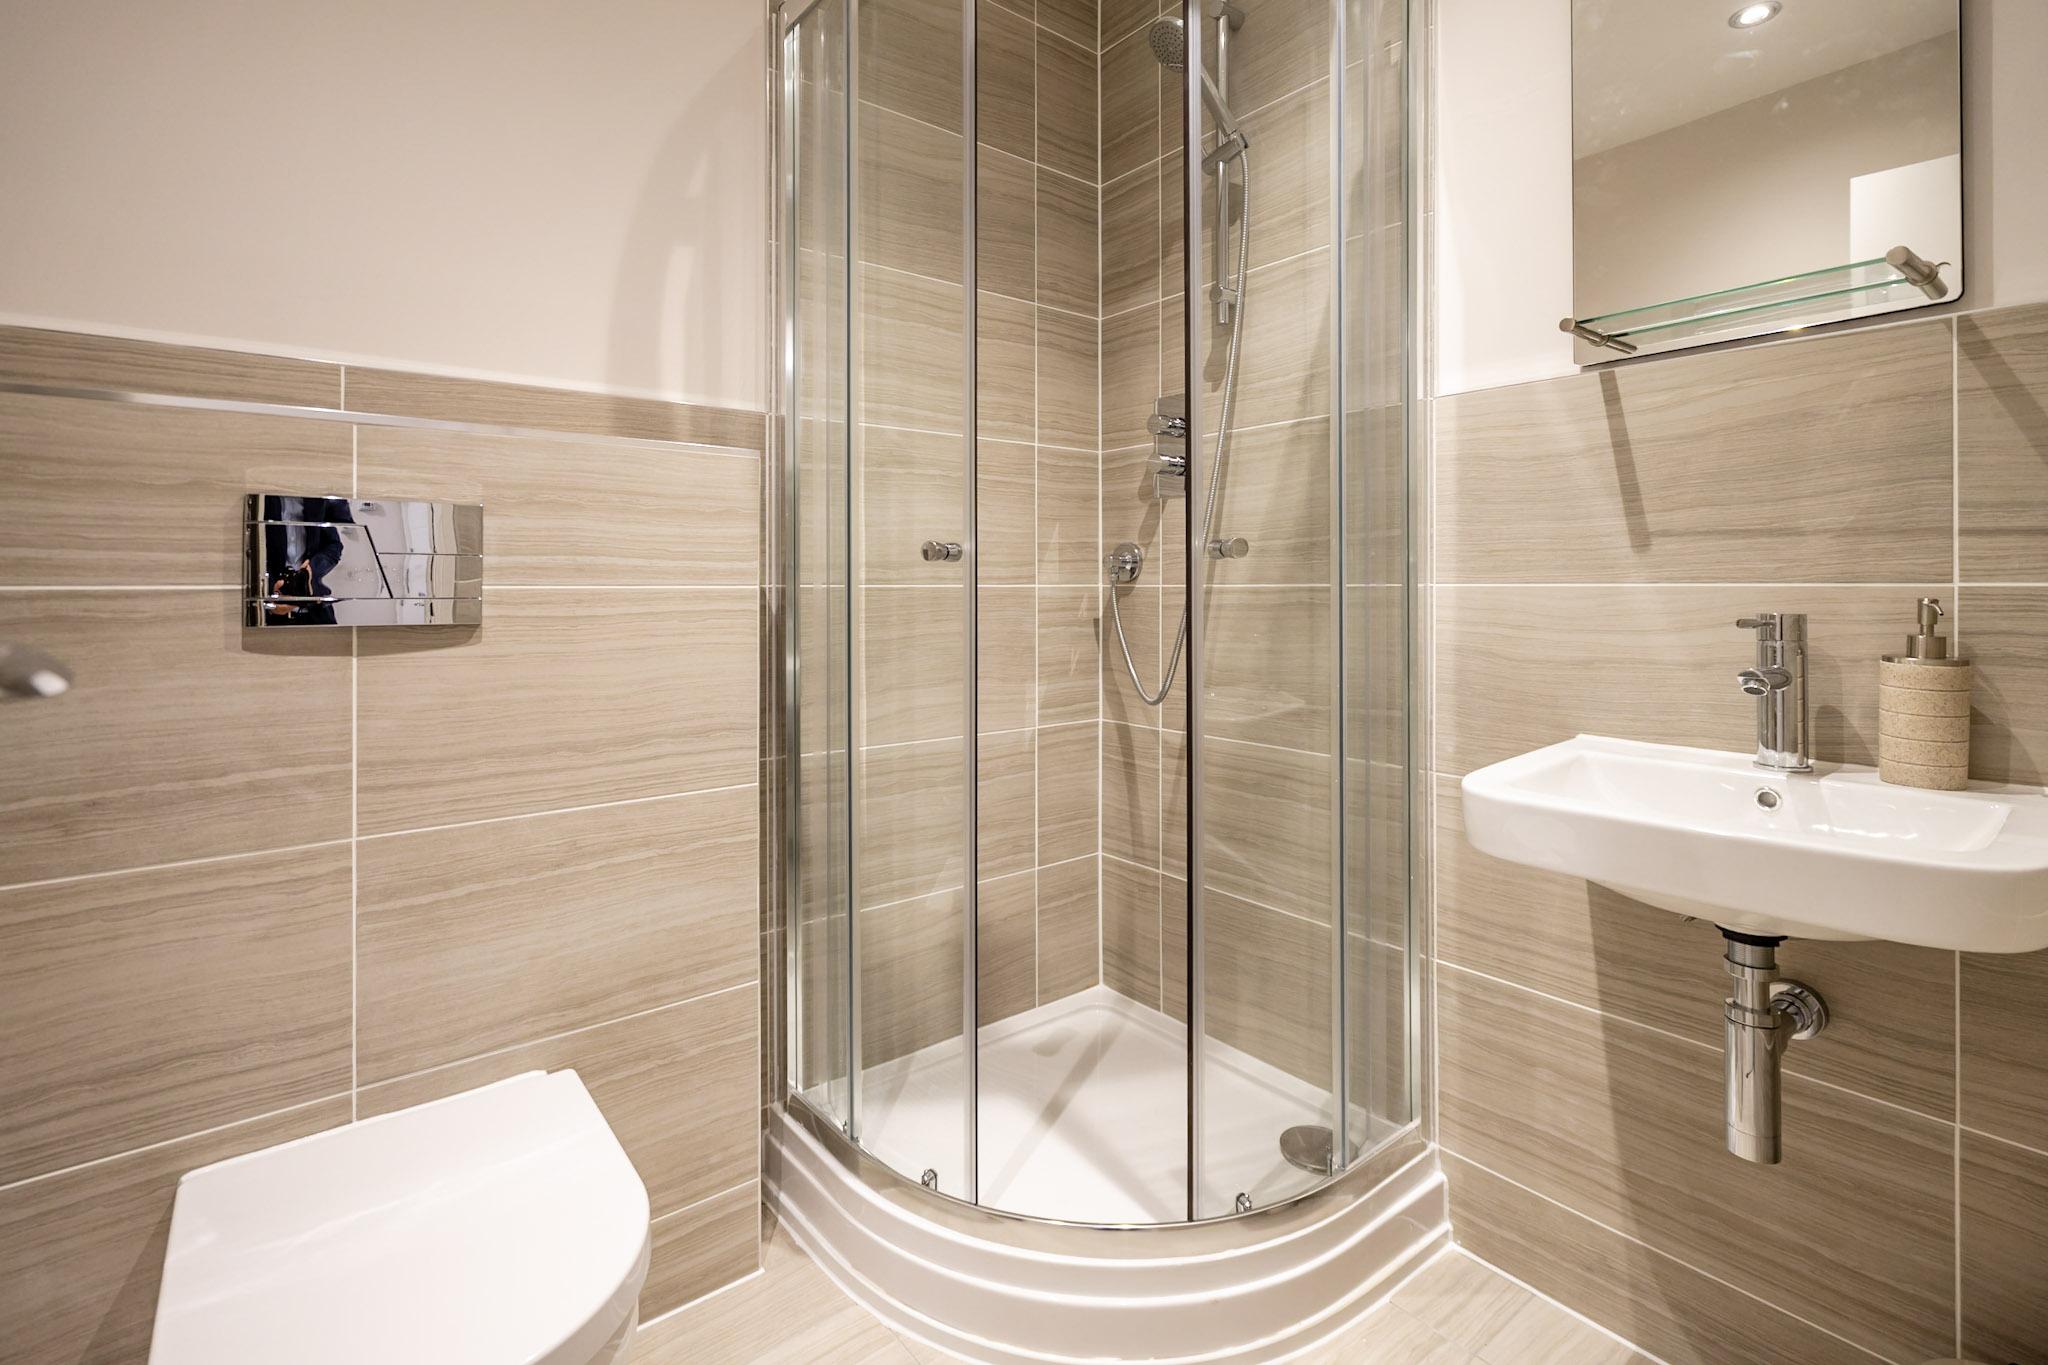 Bathroom at London Mews Serviced Apartments - Citybase Apartments